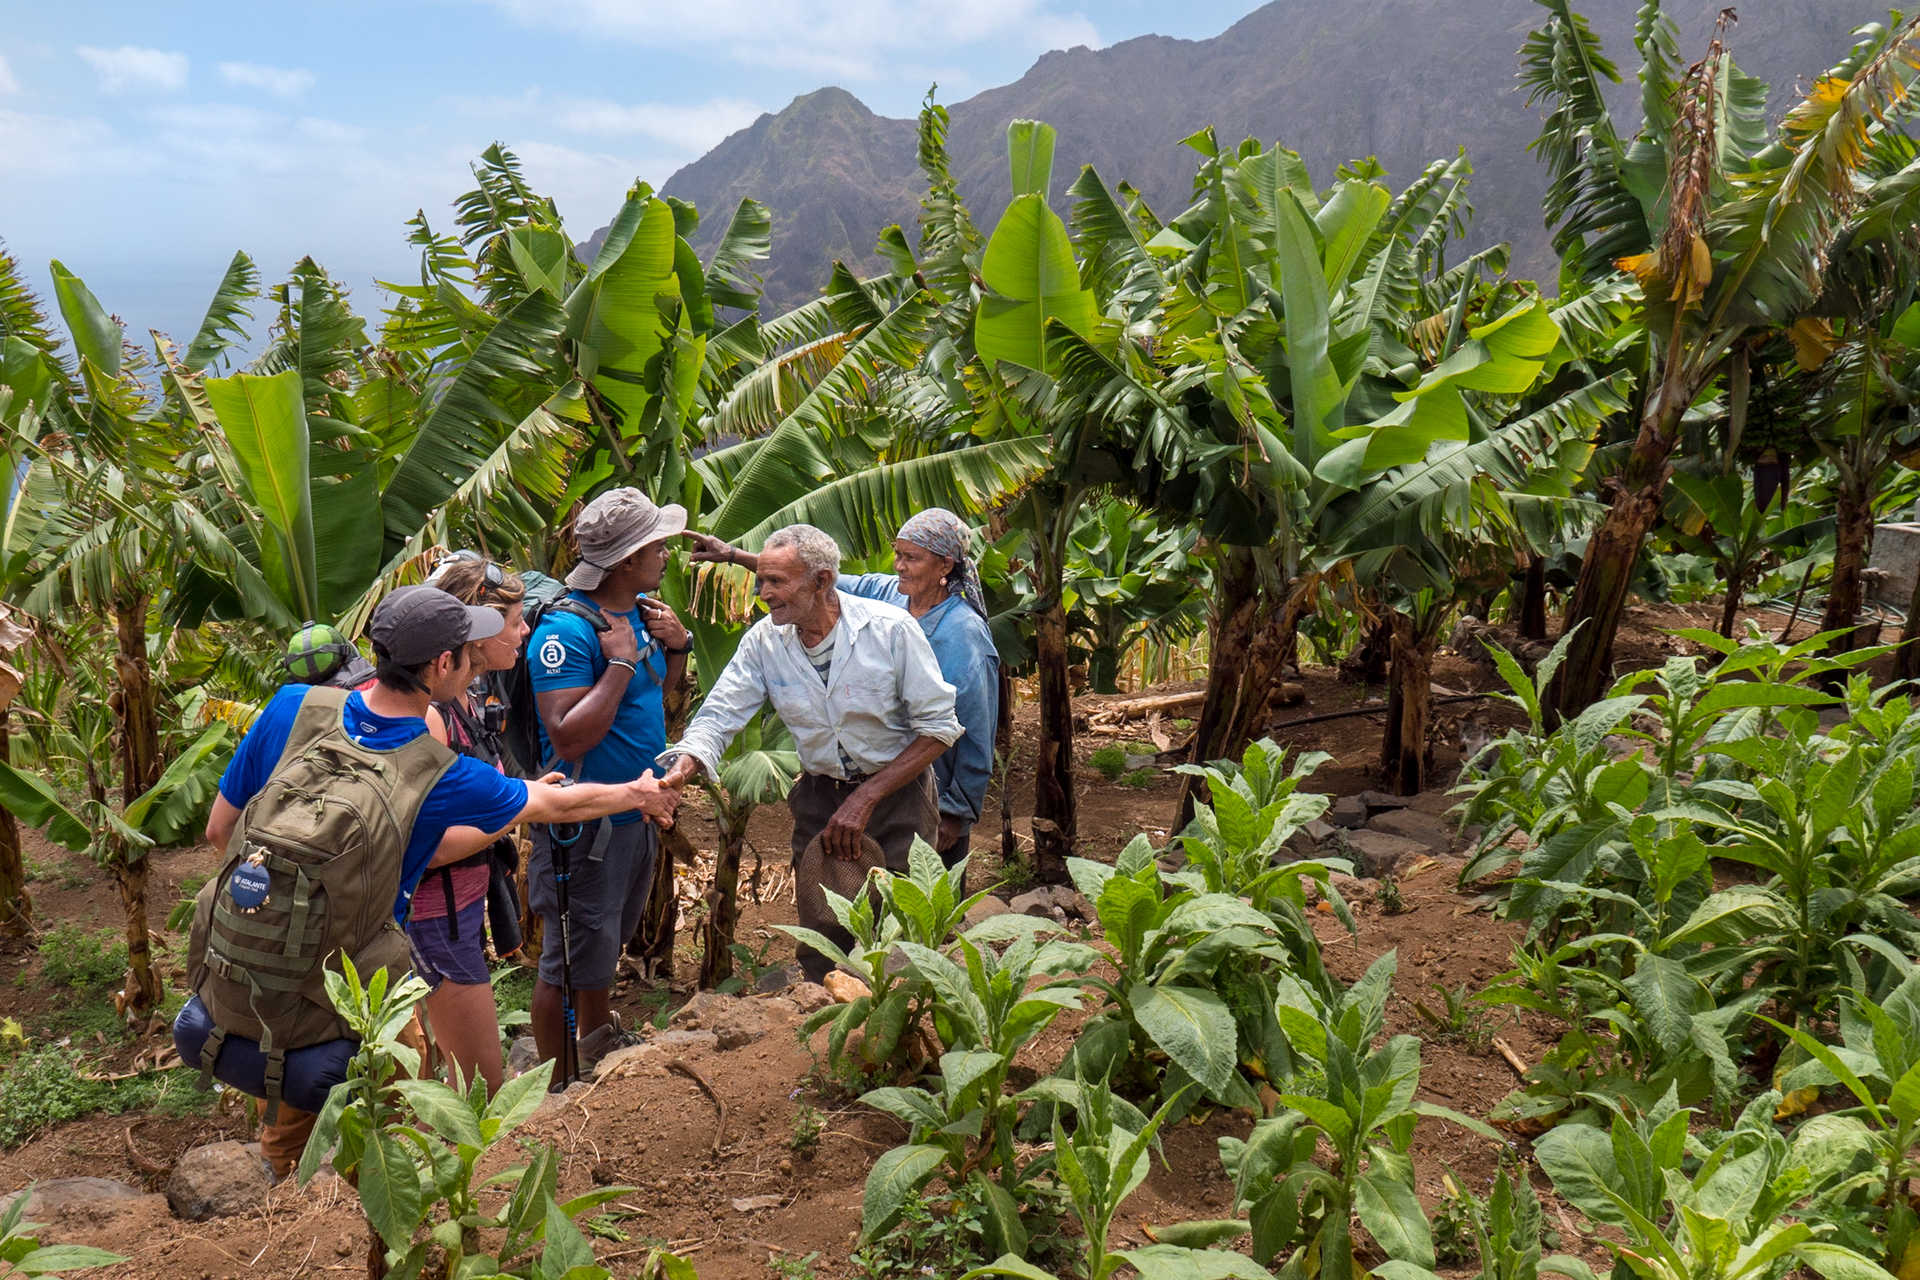 Rencontres et vie locale sur Santo Antao